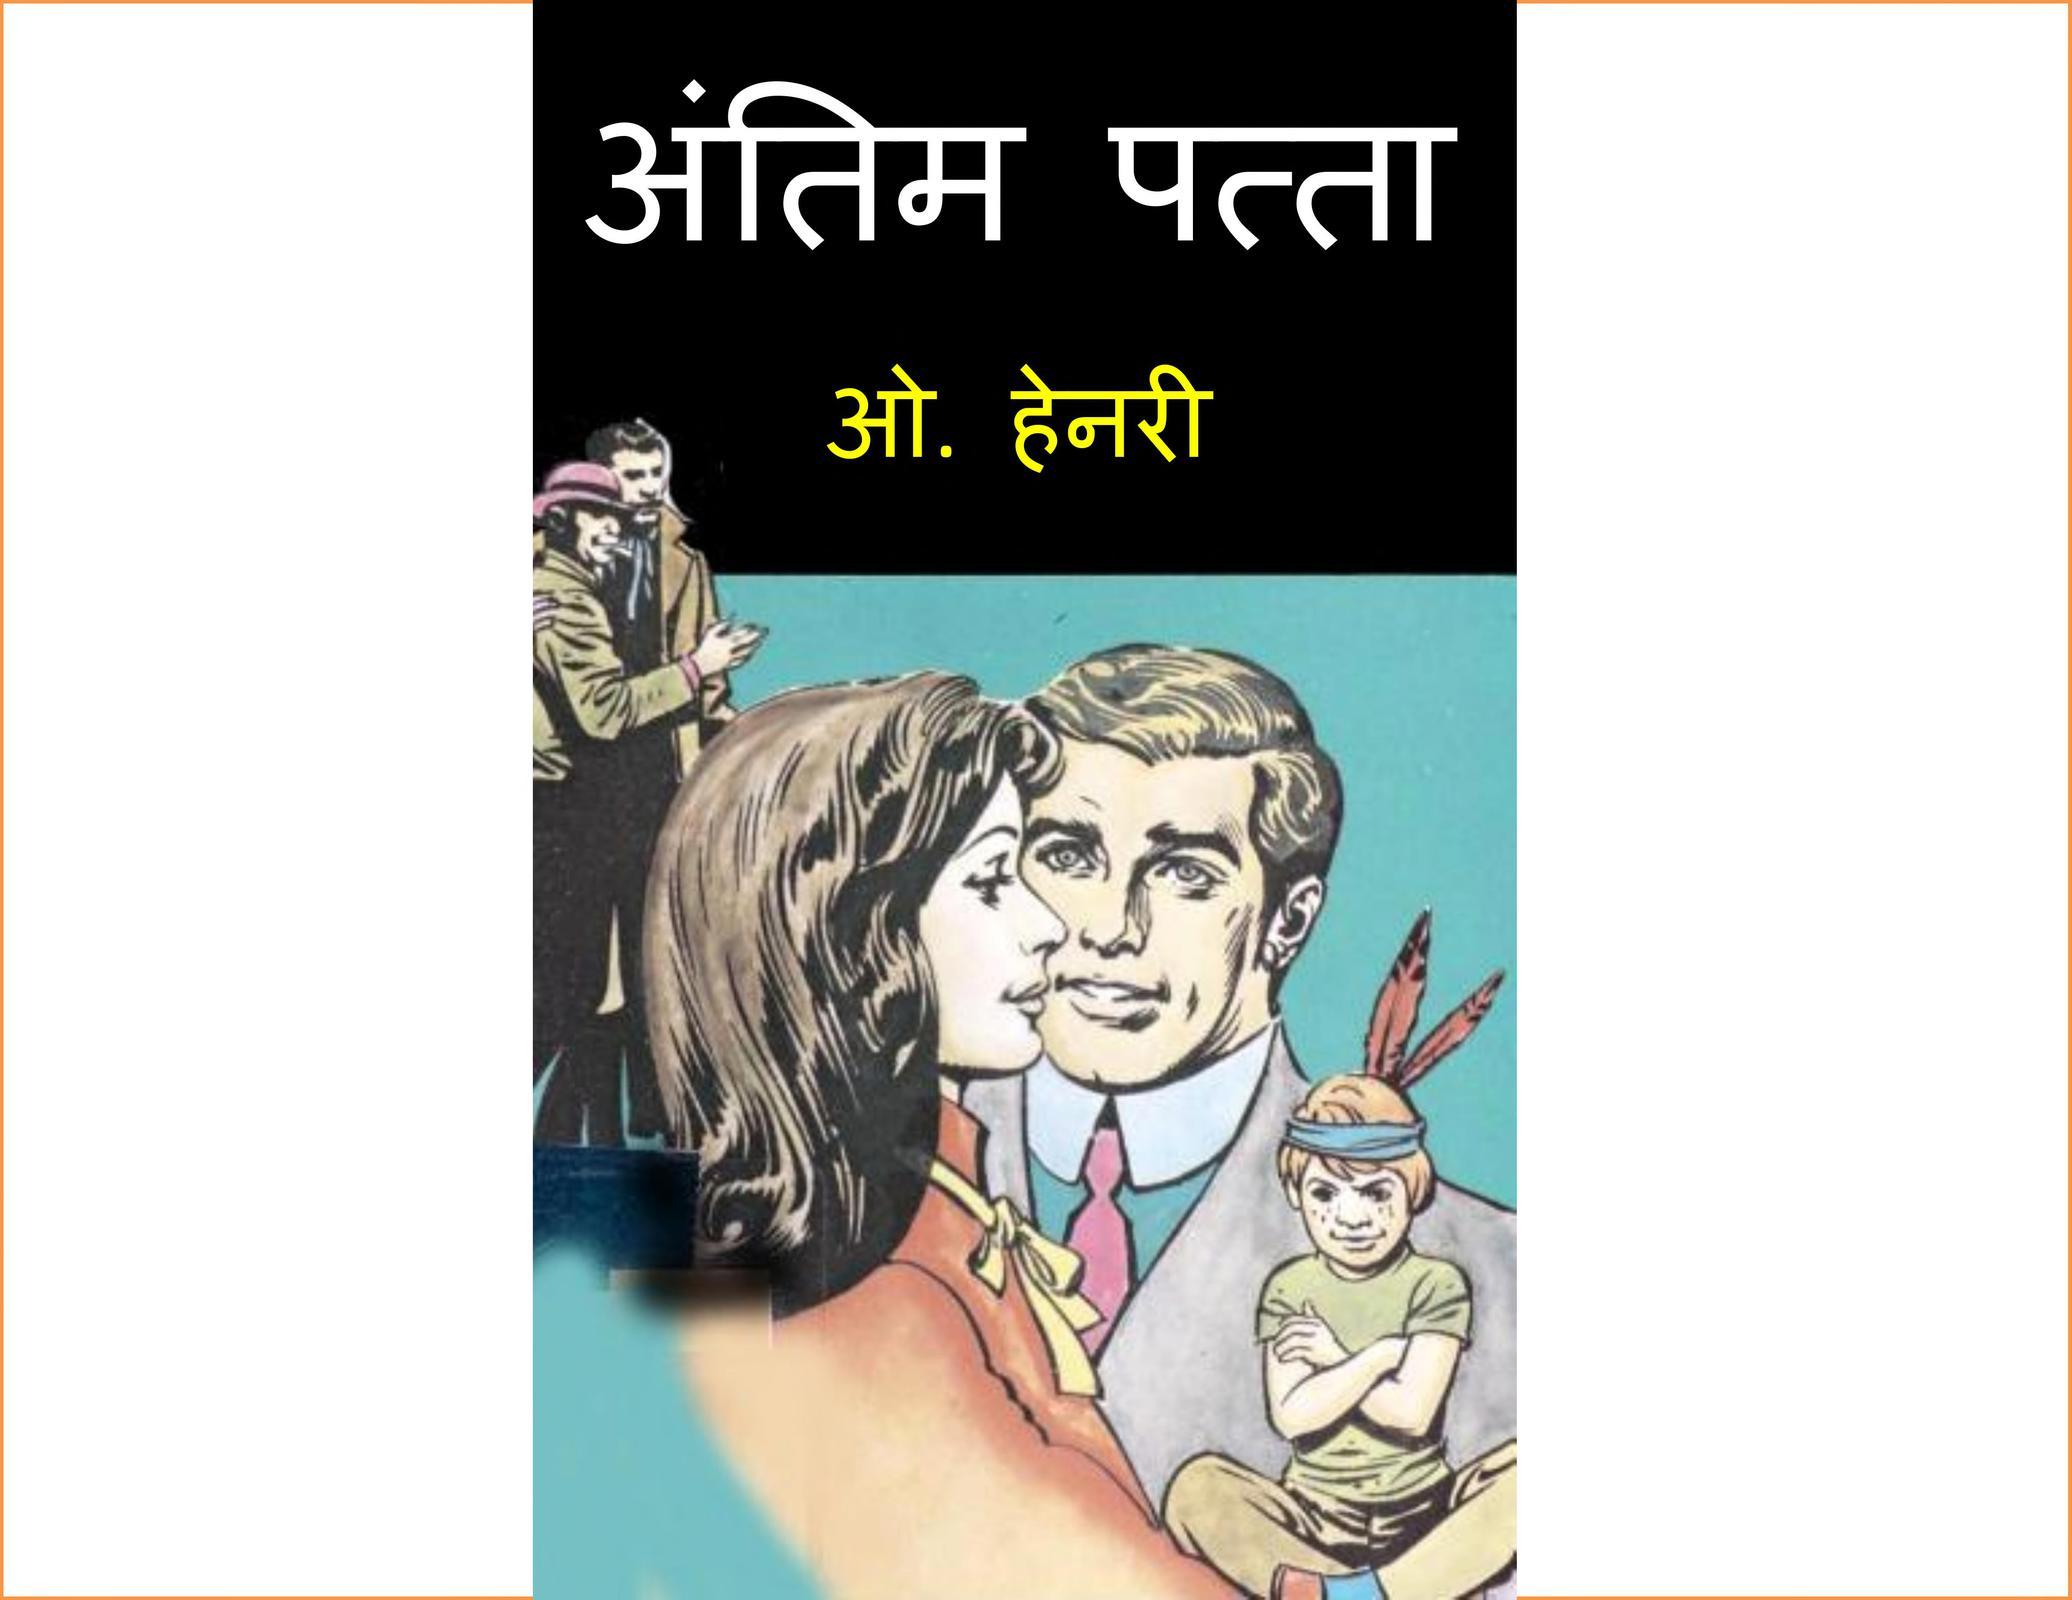 Book Image : अंतिम पत्ता - कॉमिक - Antim Patta - Last Leaf (Comic)